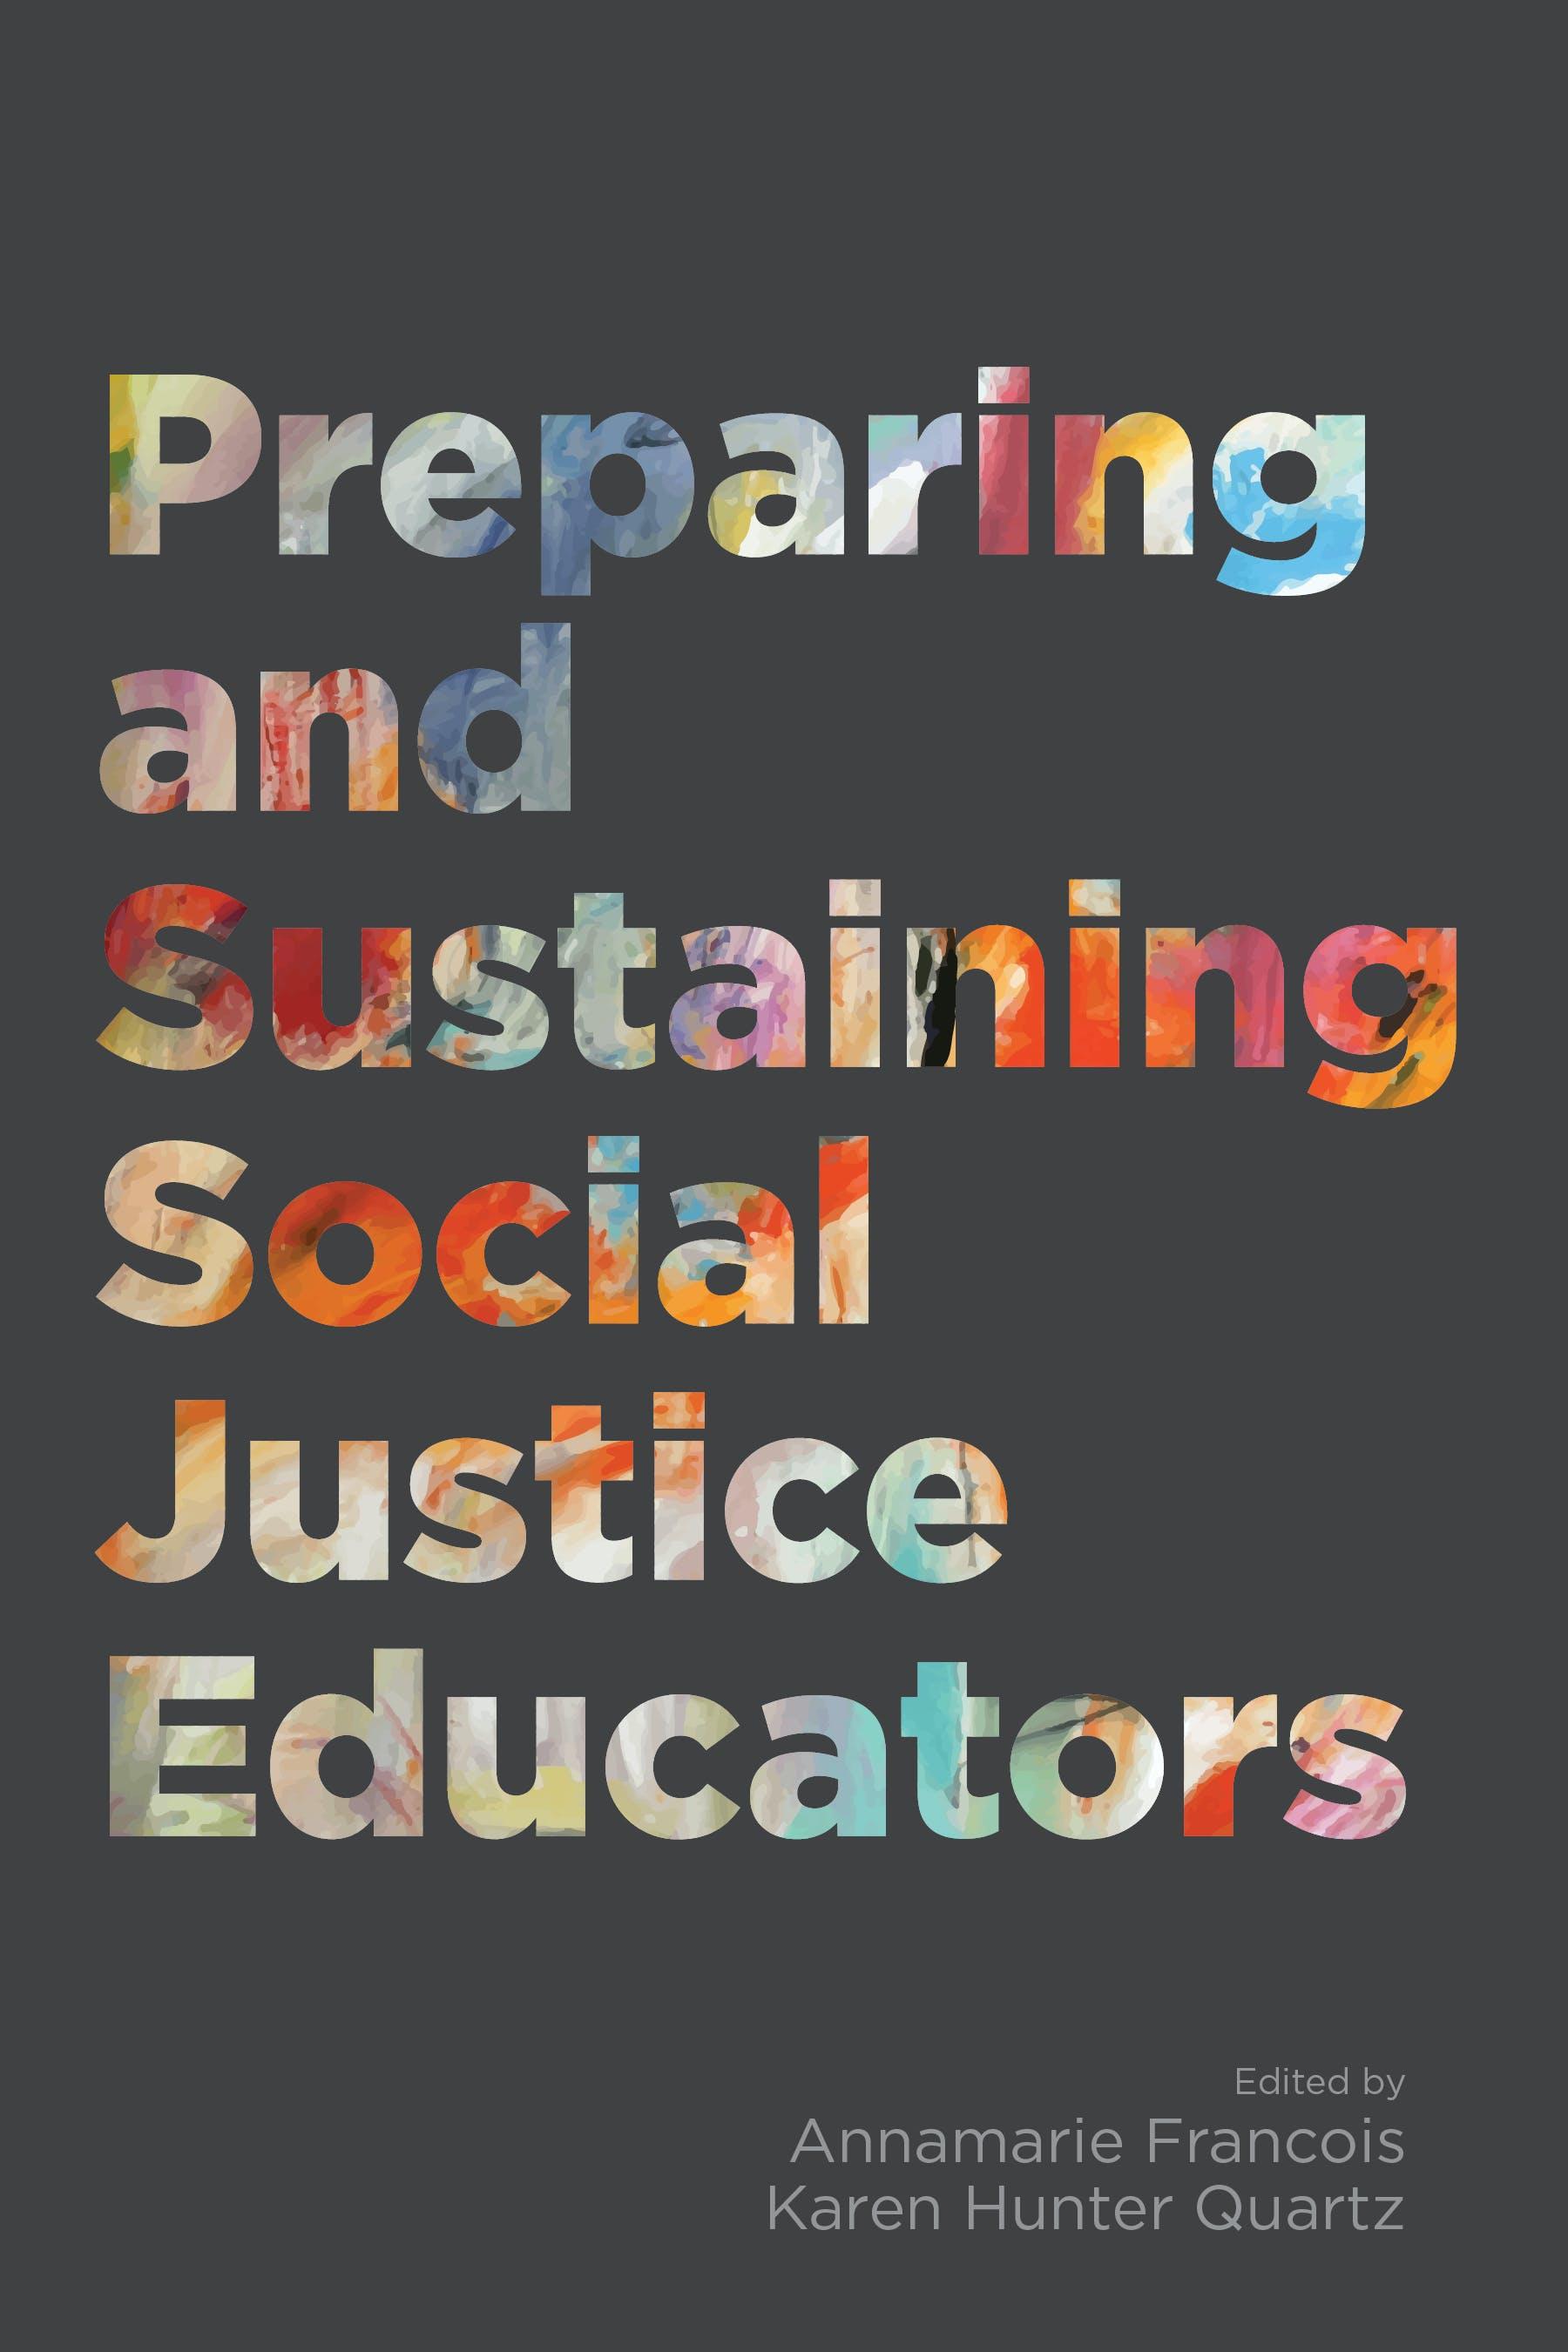 Book Cover of Preparing and Sustaining Social Justice Educators - Edited by Annamarie Francois and Karen Hunter Quartz